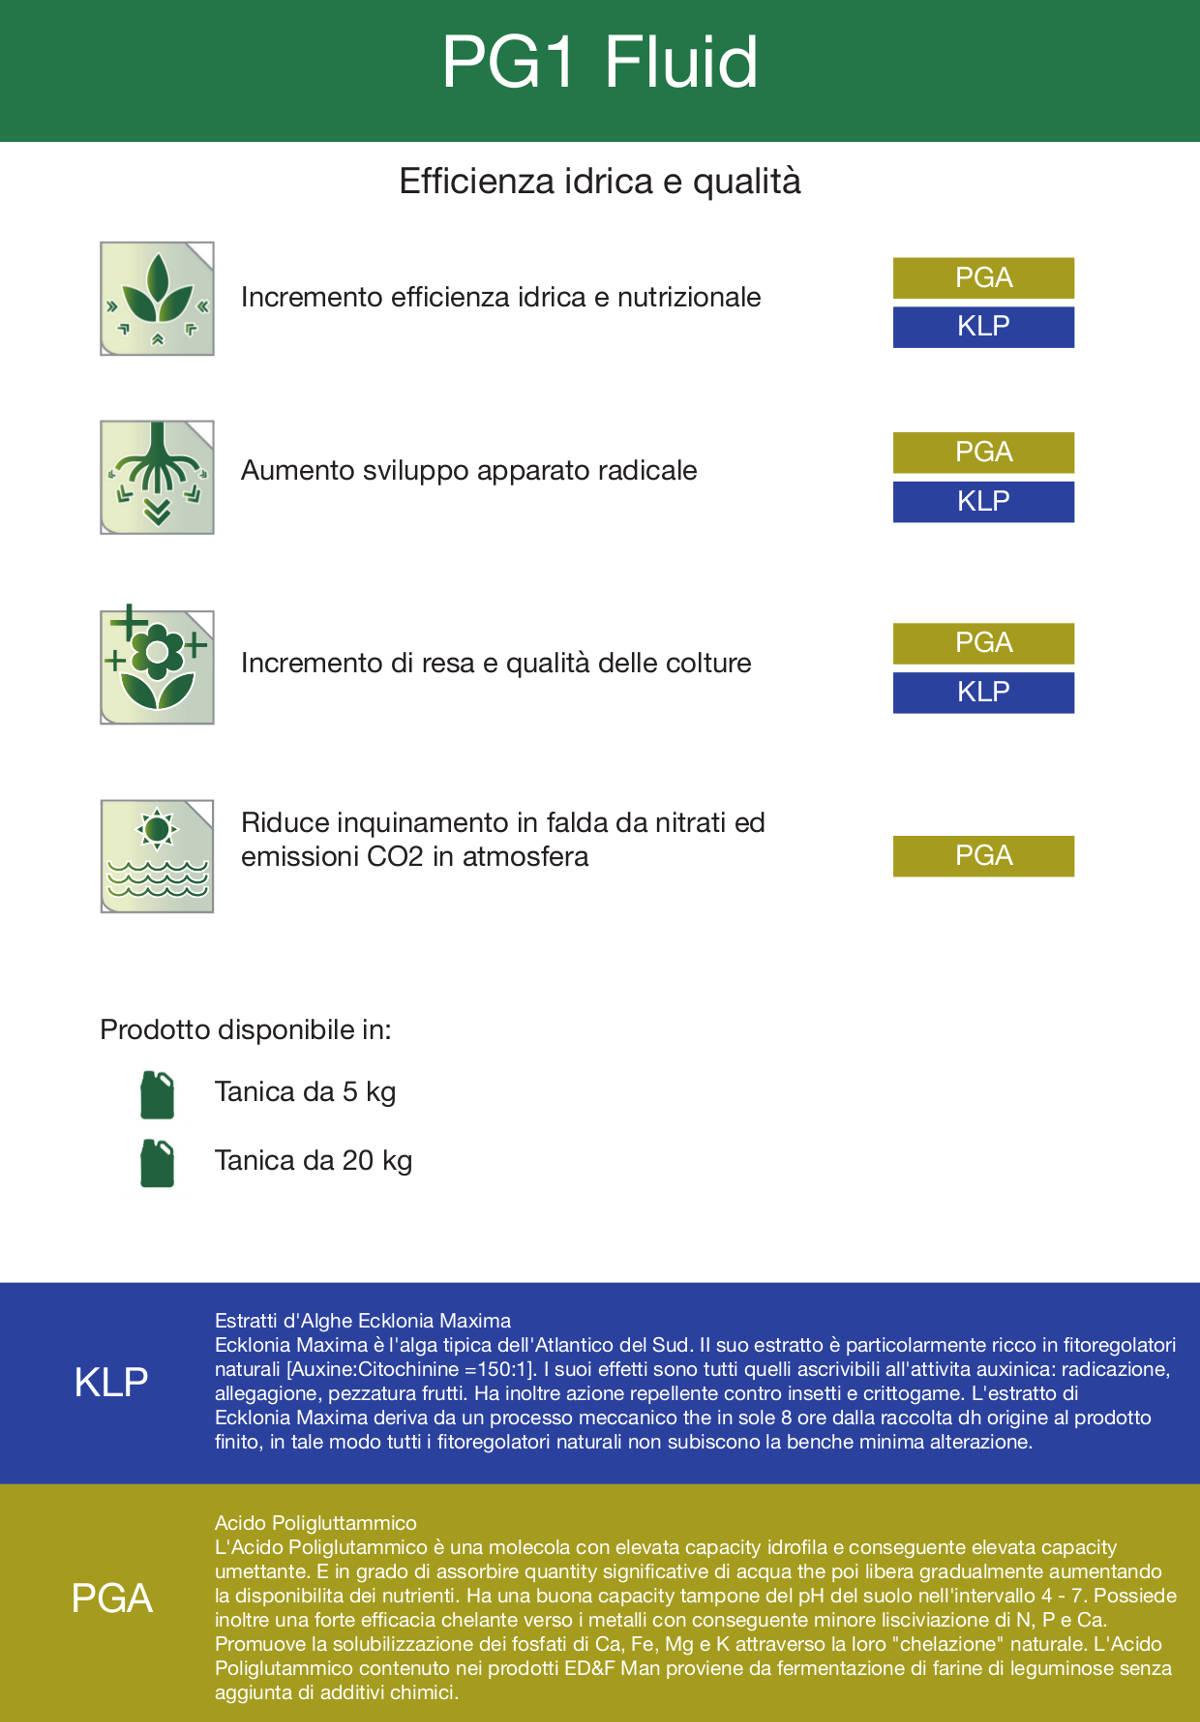 PG1 Fluid concime con alghe Ecklonia Maxima